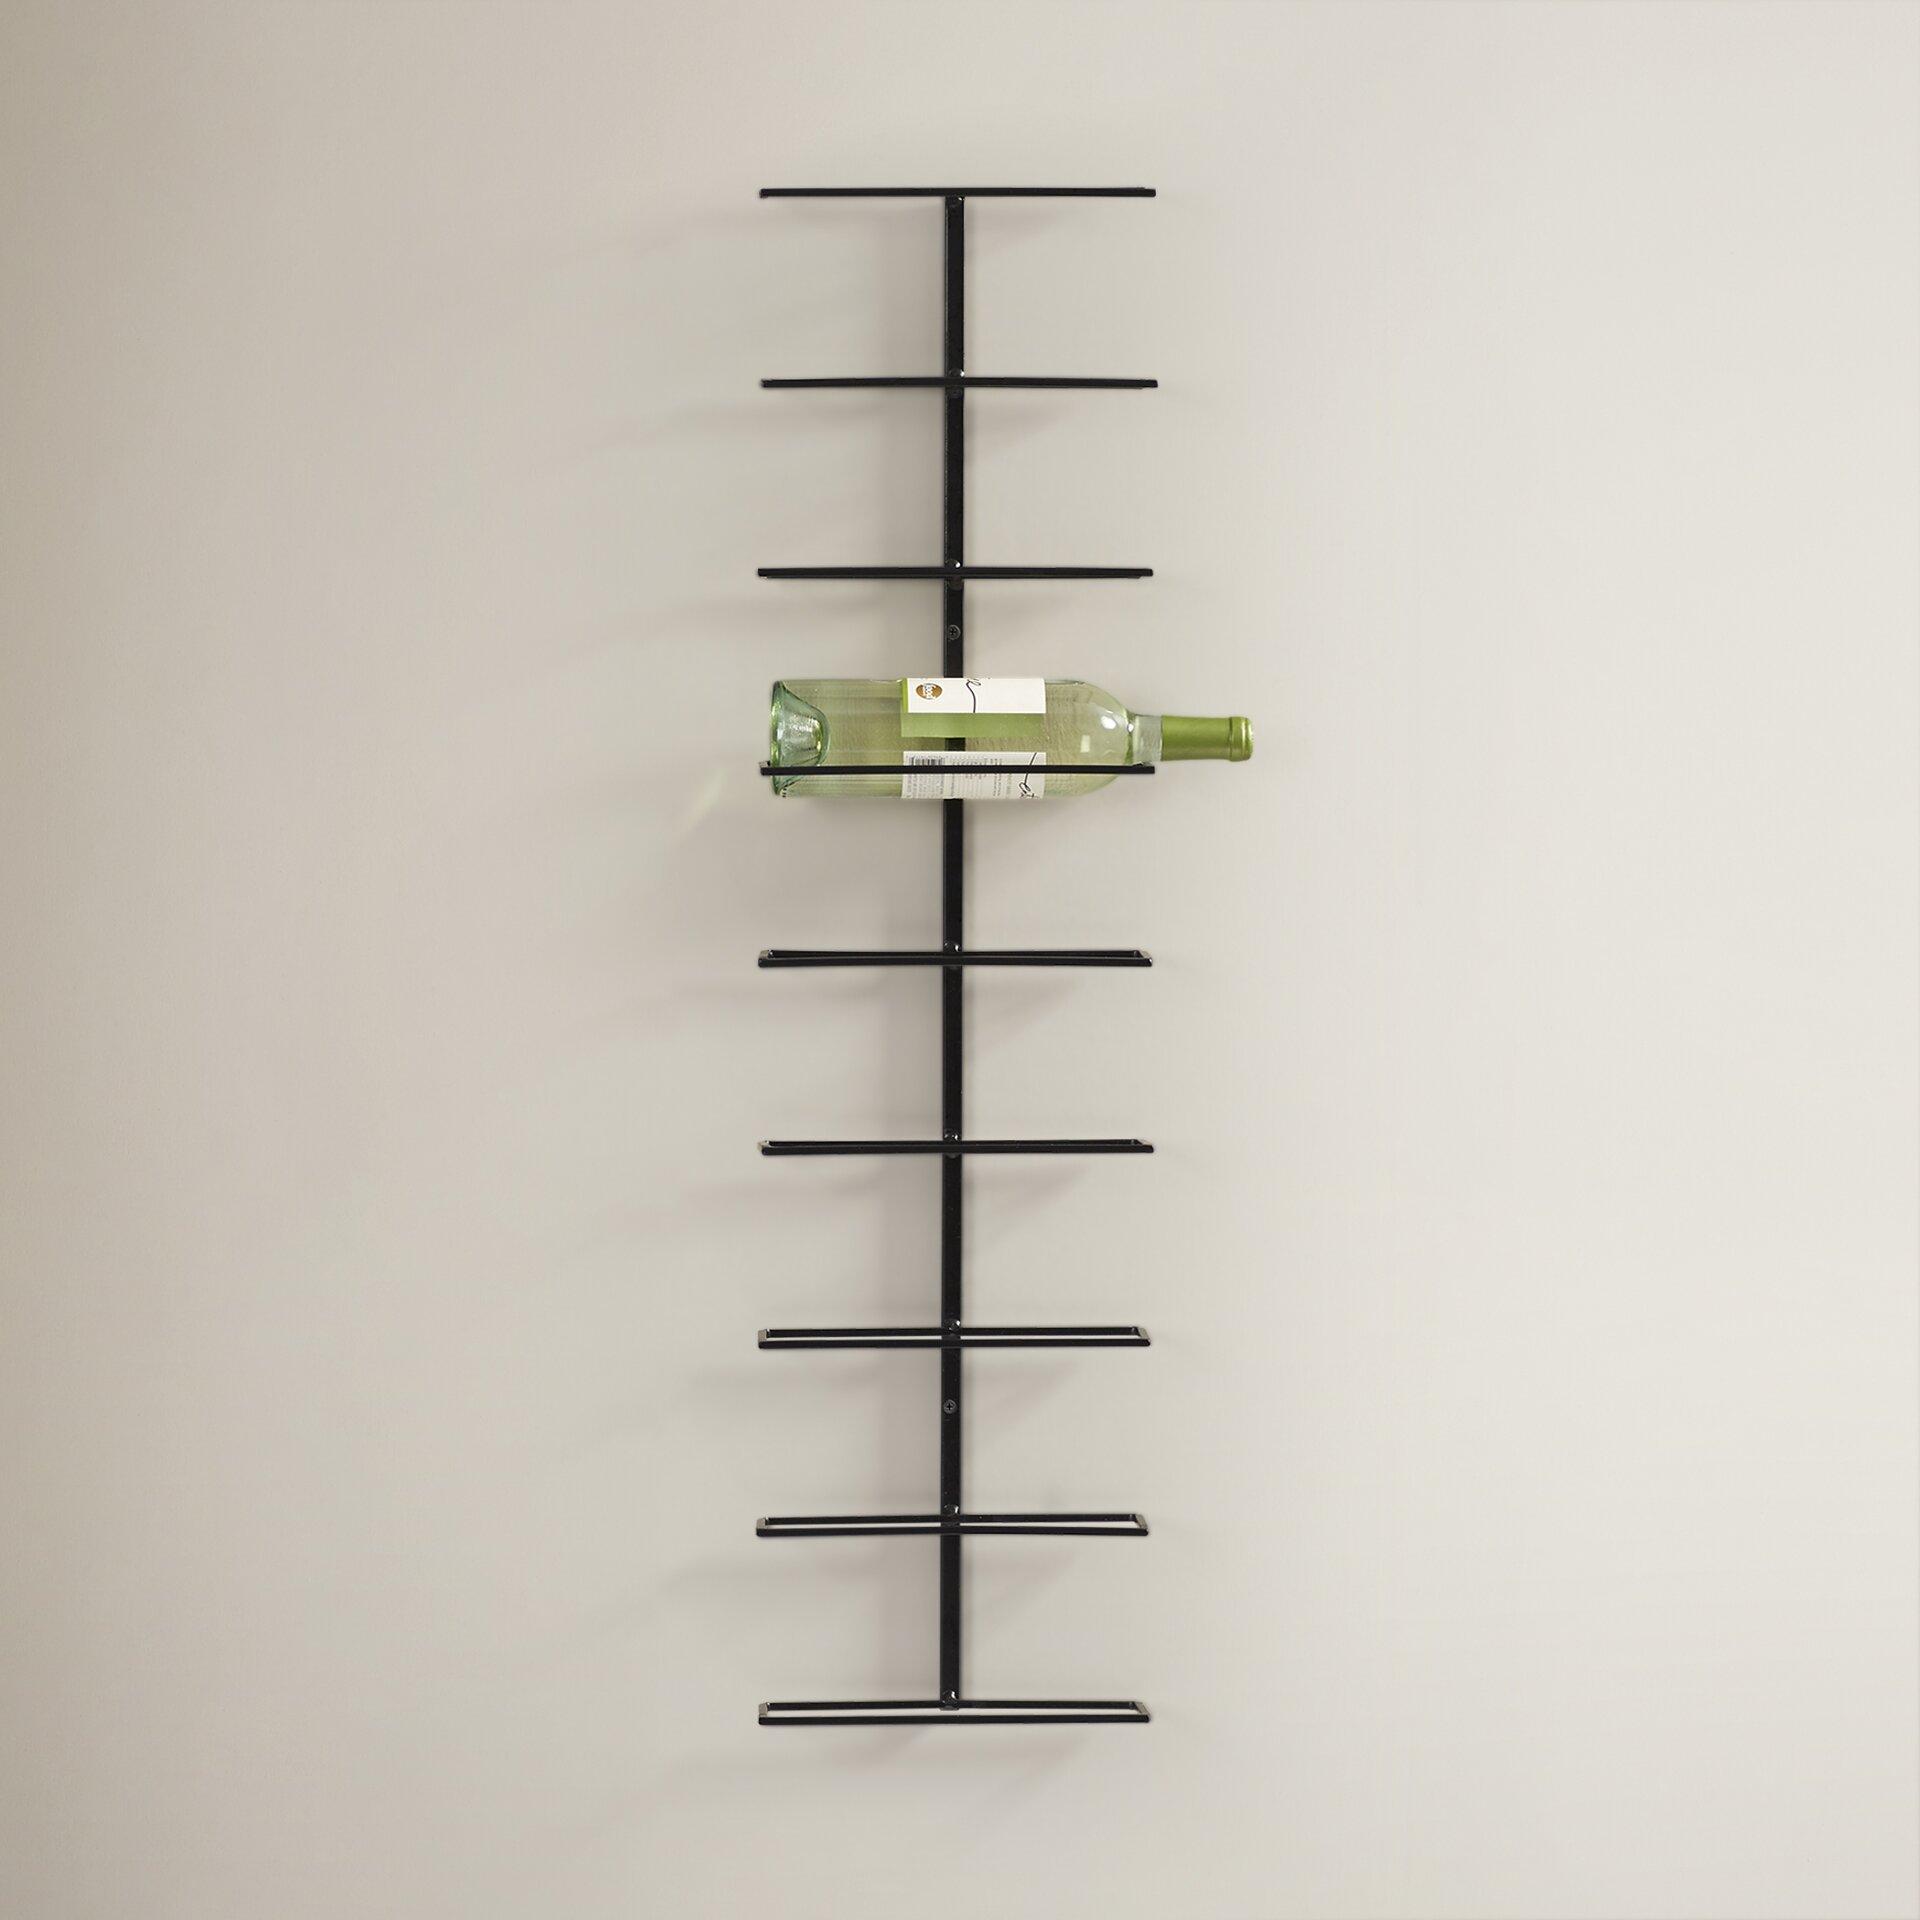 Metal Wine Racks Wall Mounted wall mounted wine rack. 10pcslot stainless steel wine rack bar